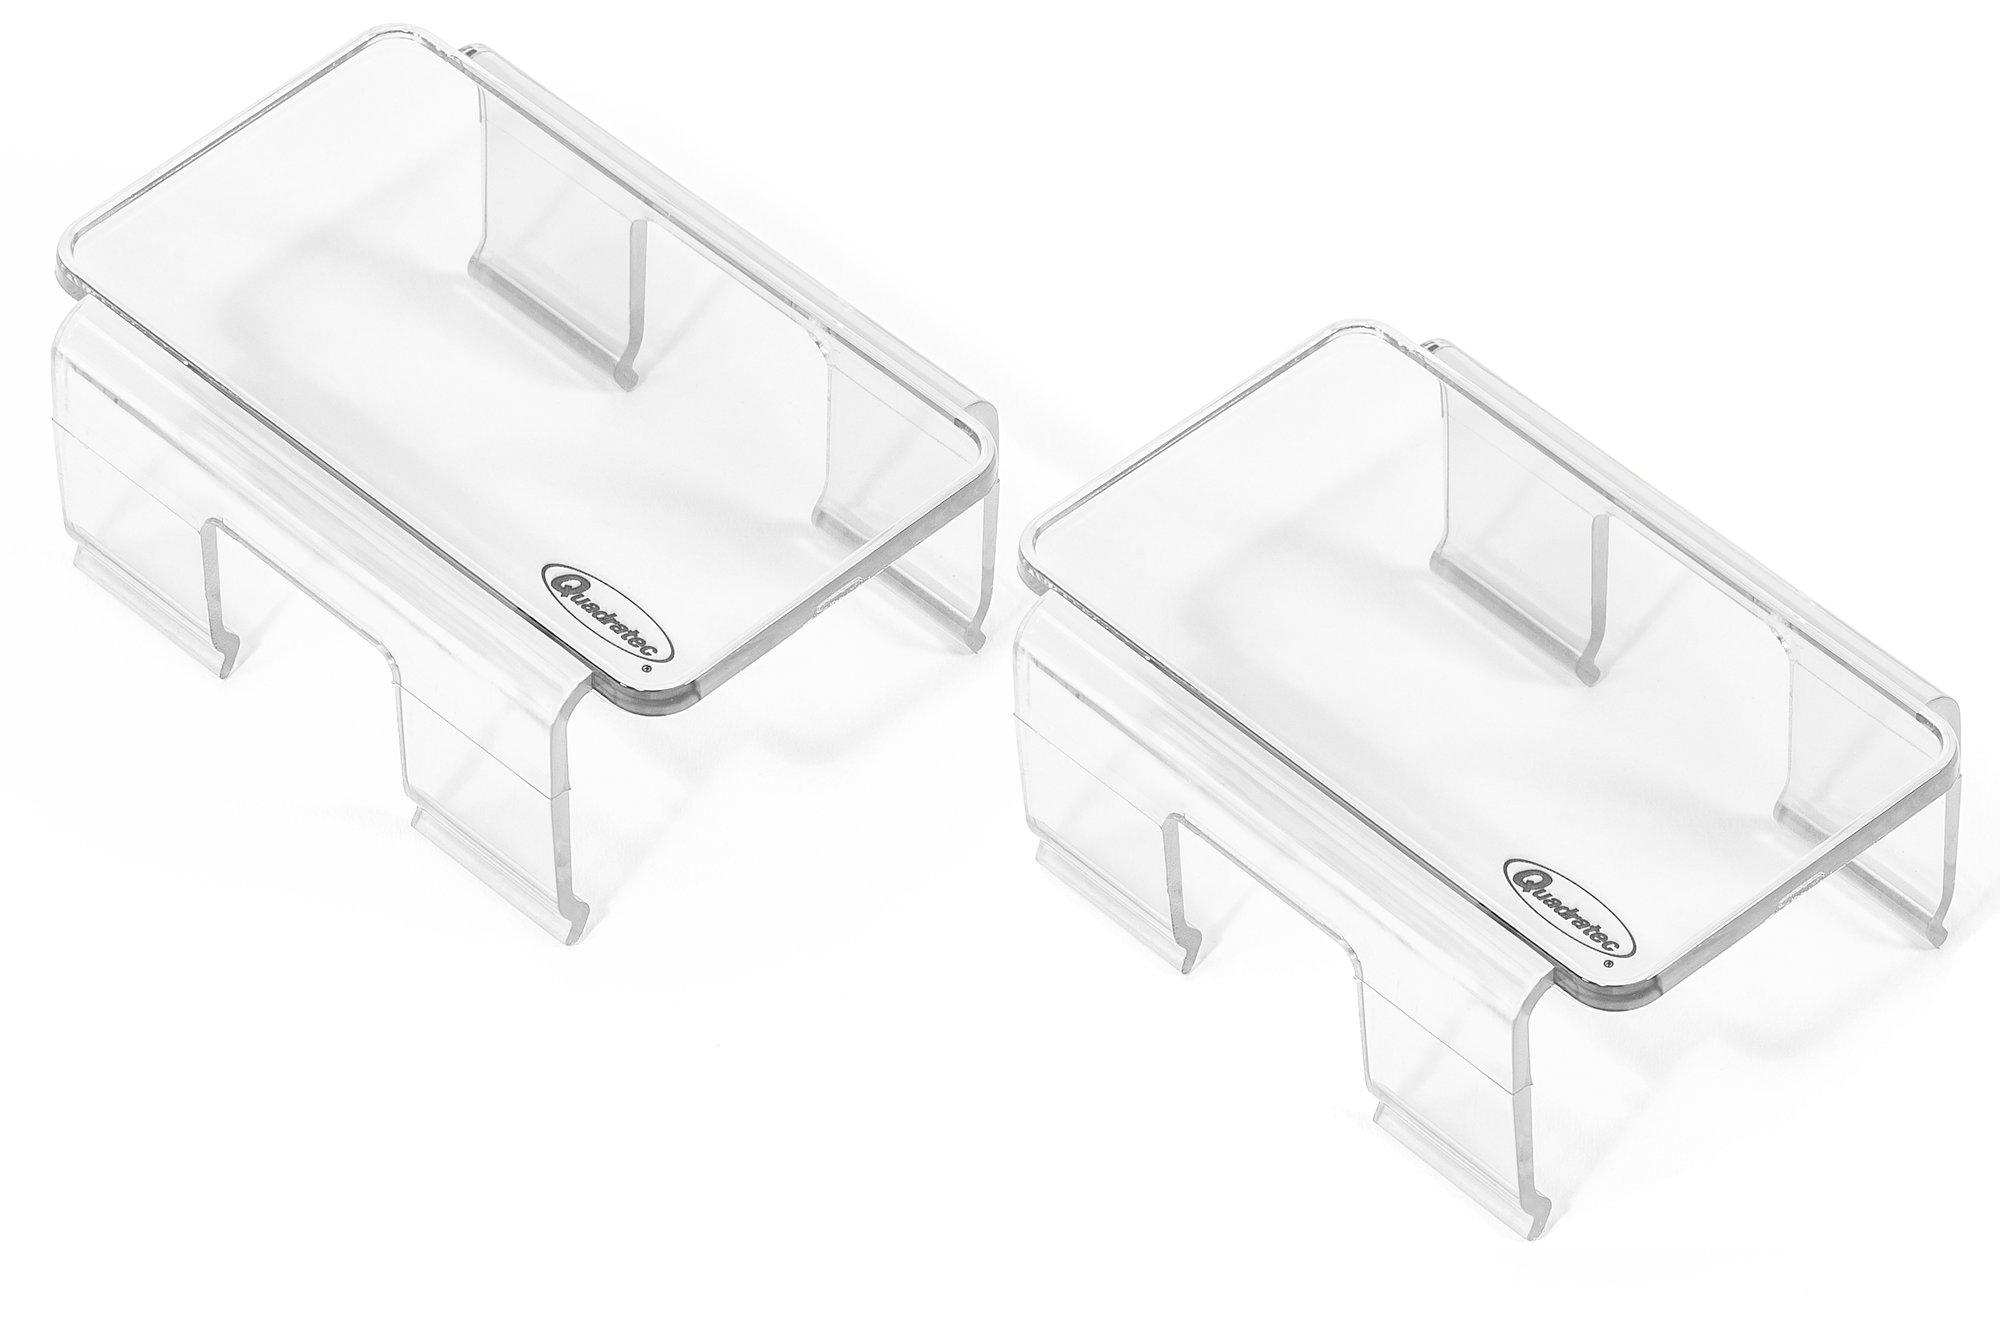 Quadratec Light Covers For 4 Rectangular Led Lights